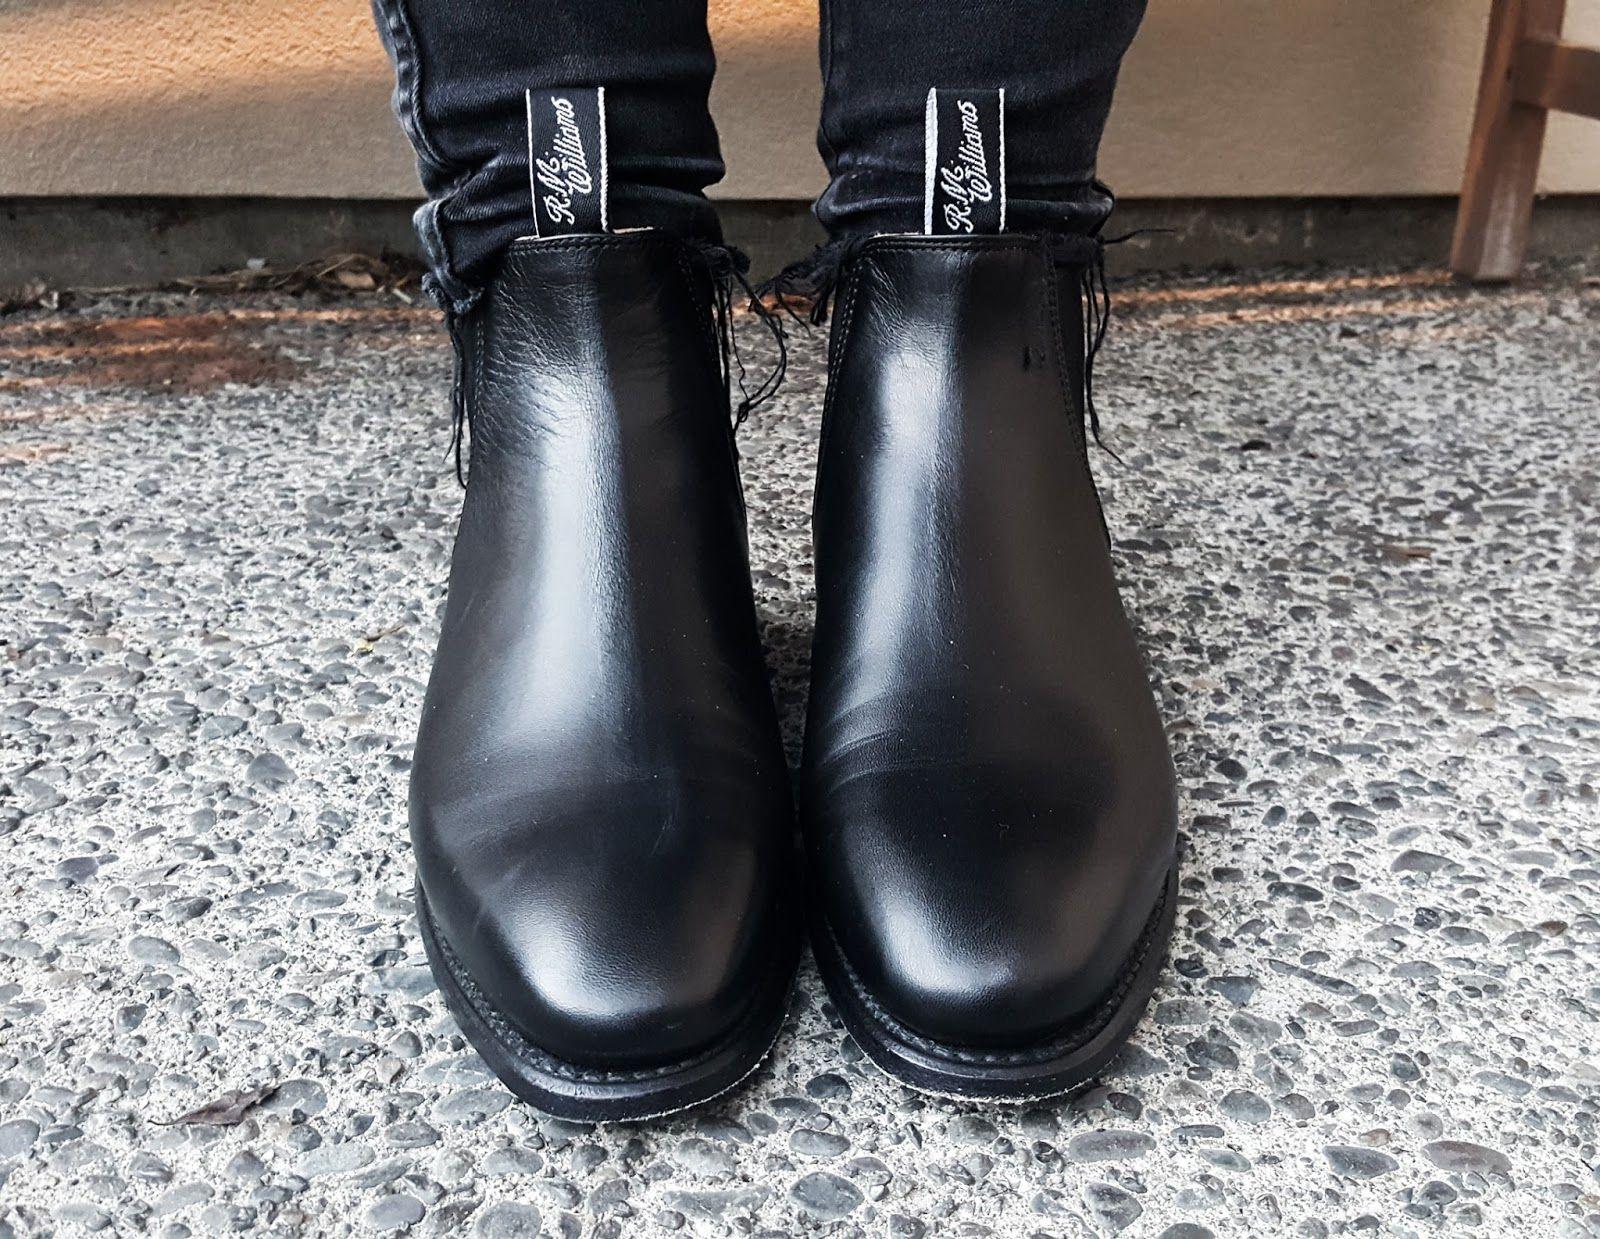 R.M Williams Adelaide Boots - Australian Outback Fashion